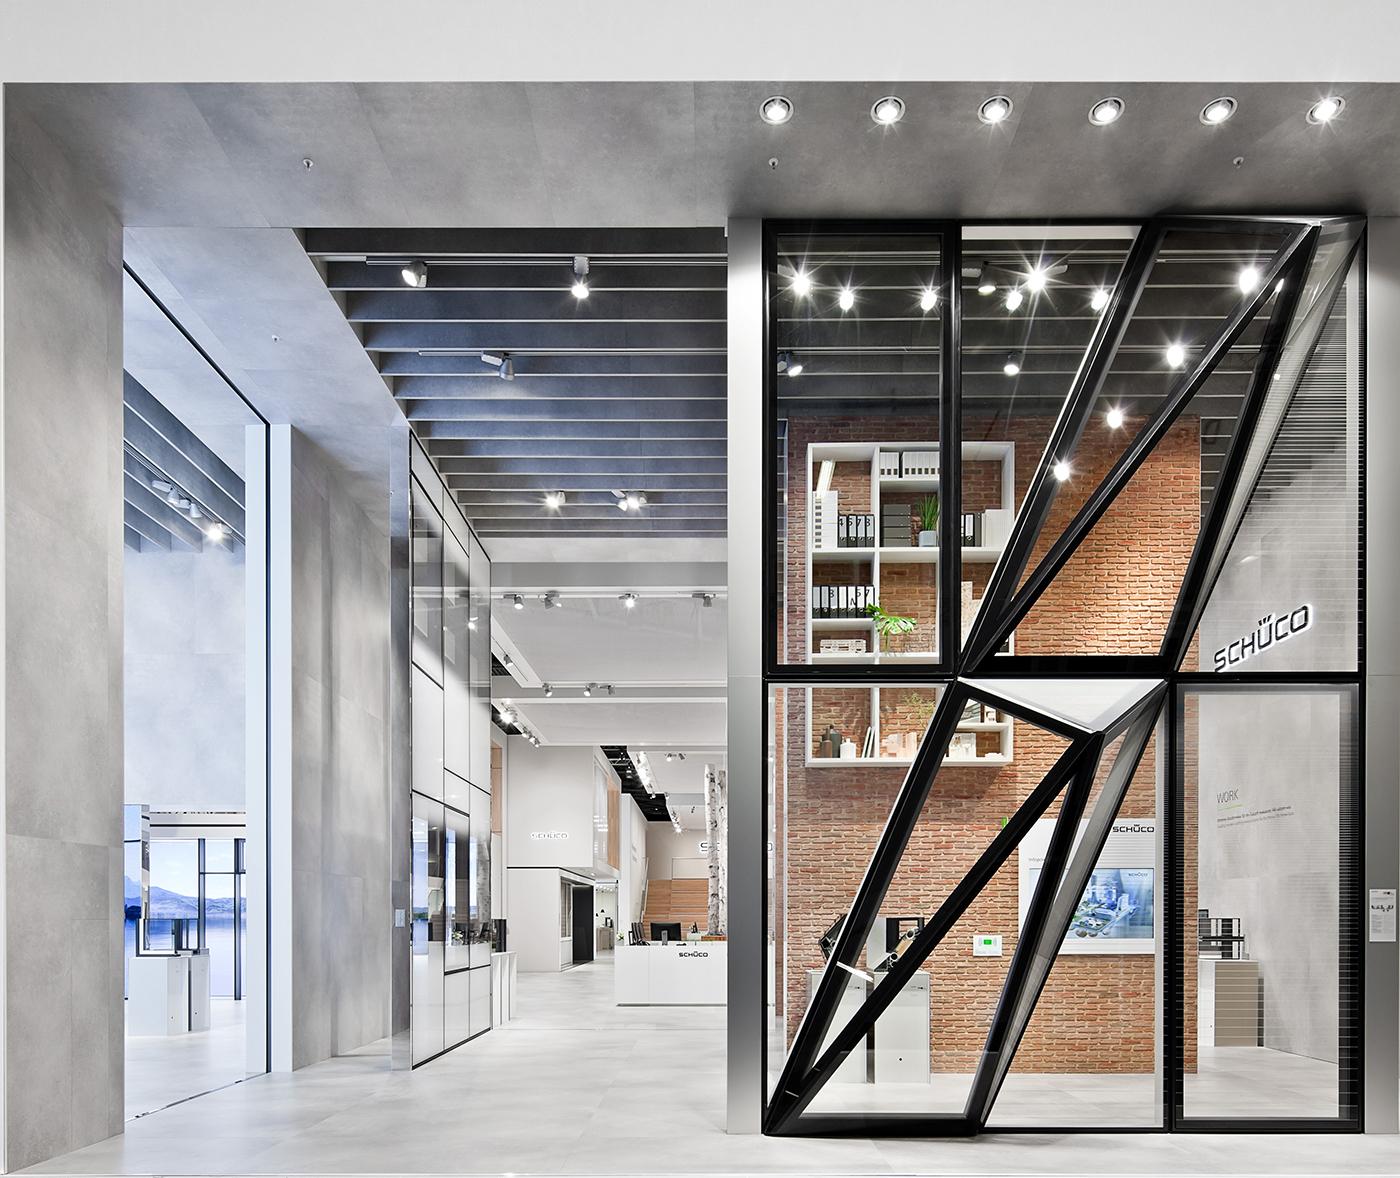 sch co bau munich 2017 on behance. Black Bedroom Furniture Sets. Home Design Ideas